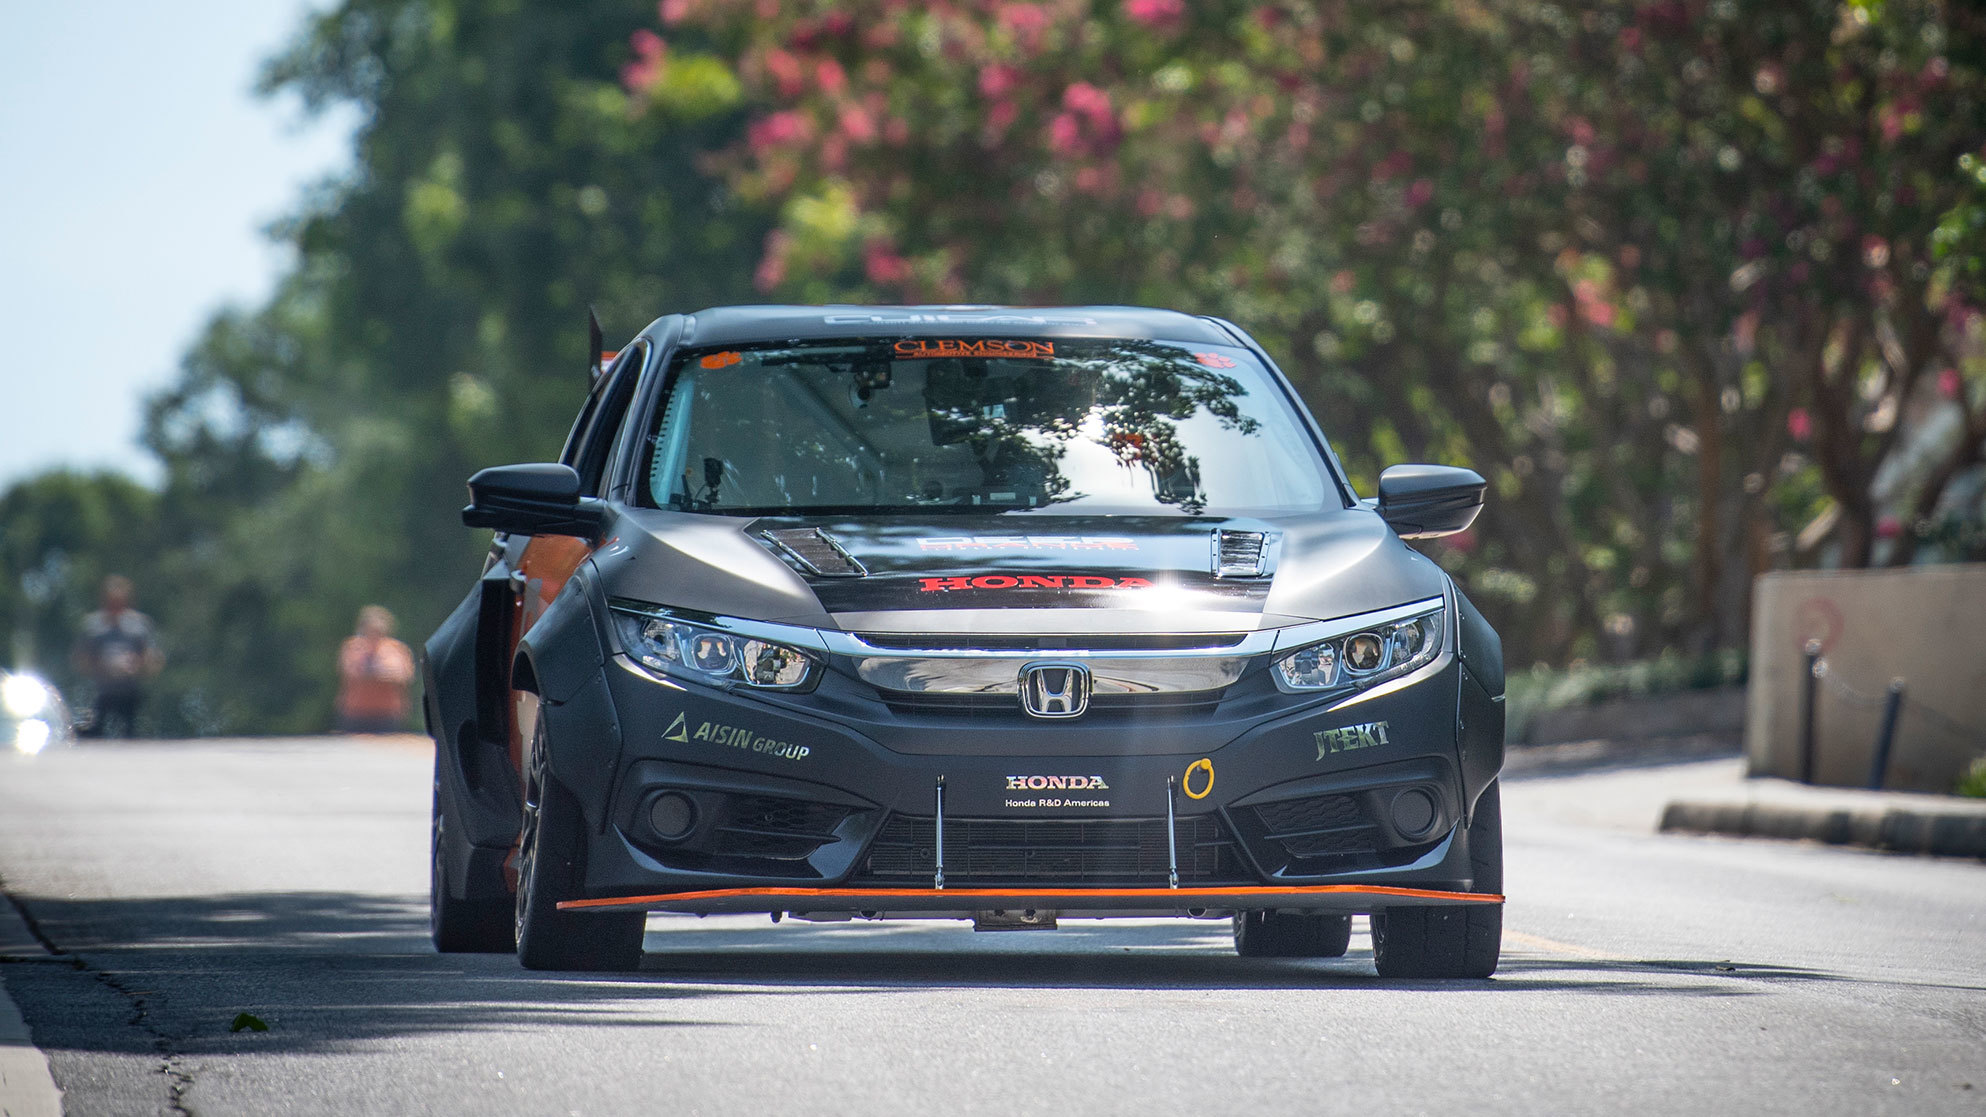 Honda Civic with hybrid powertrain byClemson University (5)